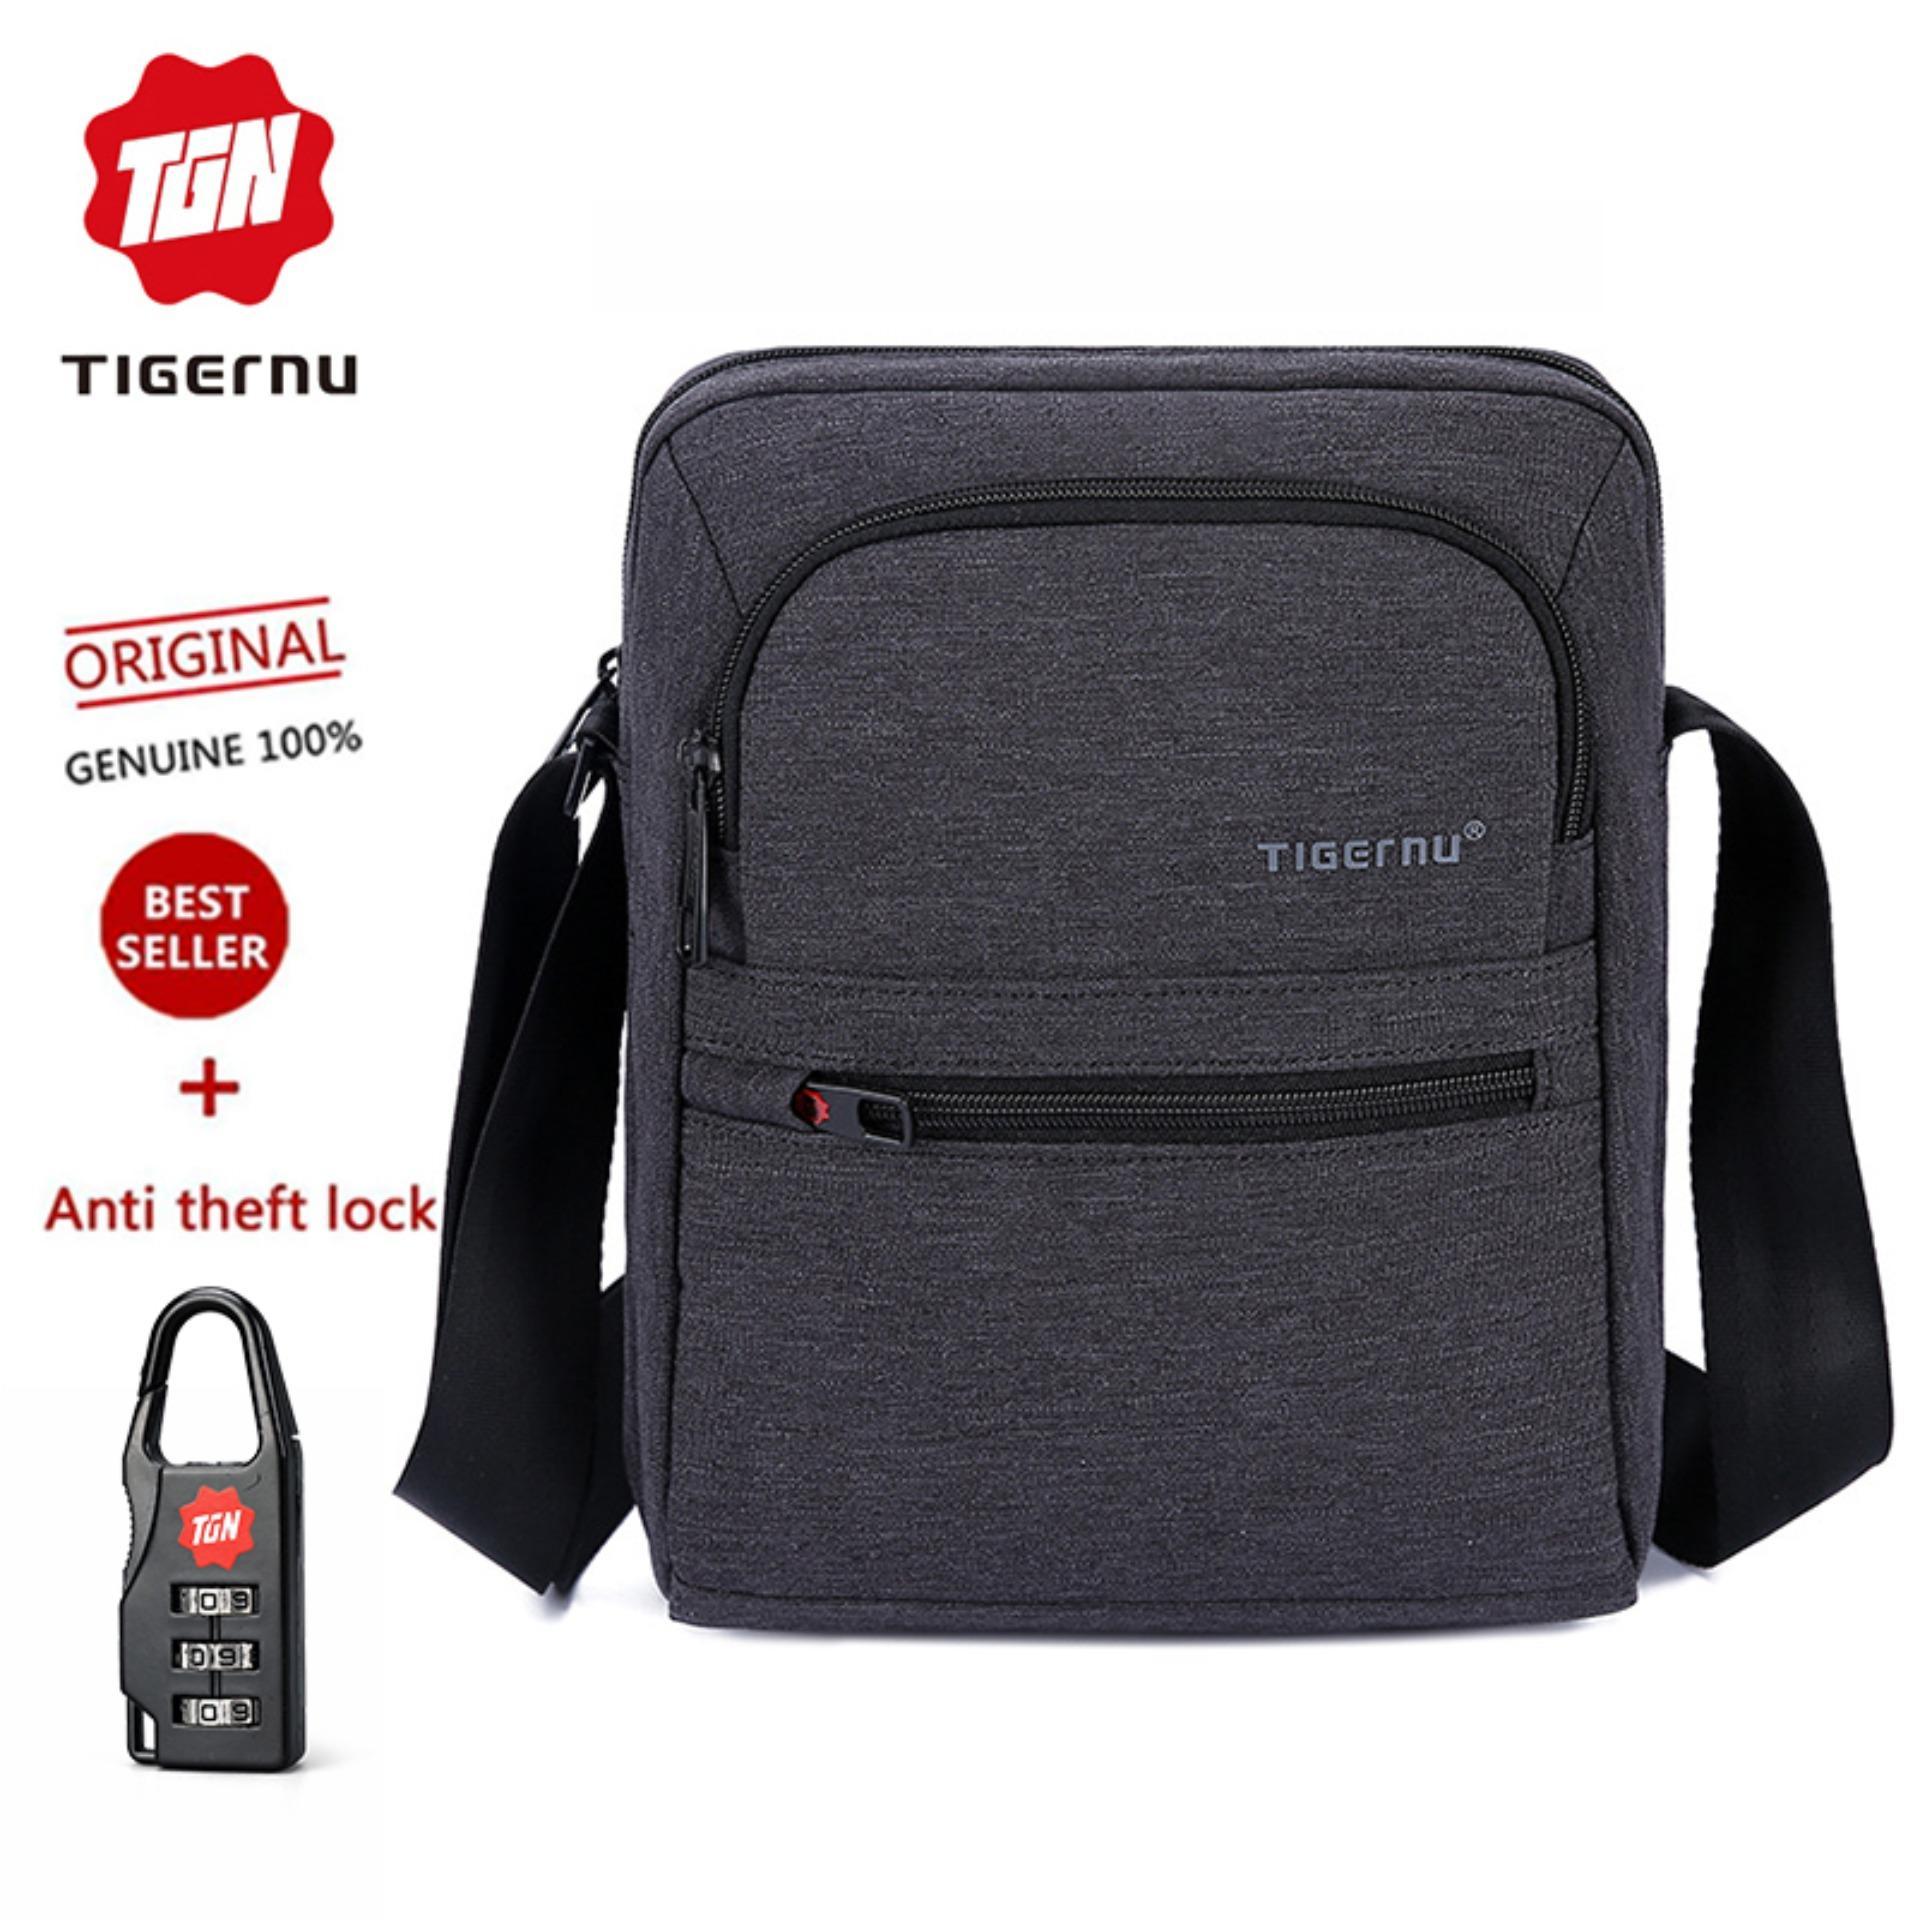 3da84843f002 Tigernu Brand Waterproof Men 's Messenger Bag Business Shoulder Bags Casual  Travel Bag T-L5105(Black Grey) - intl